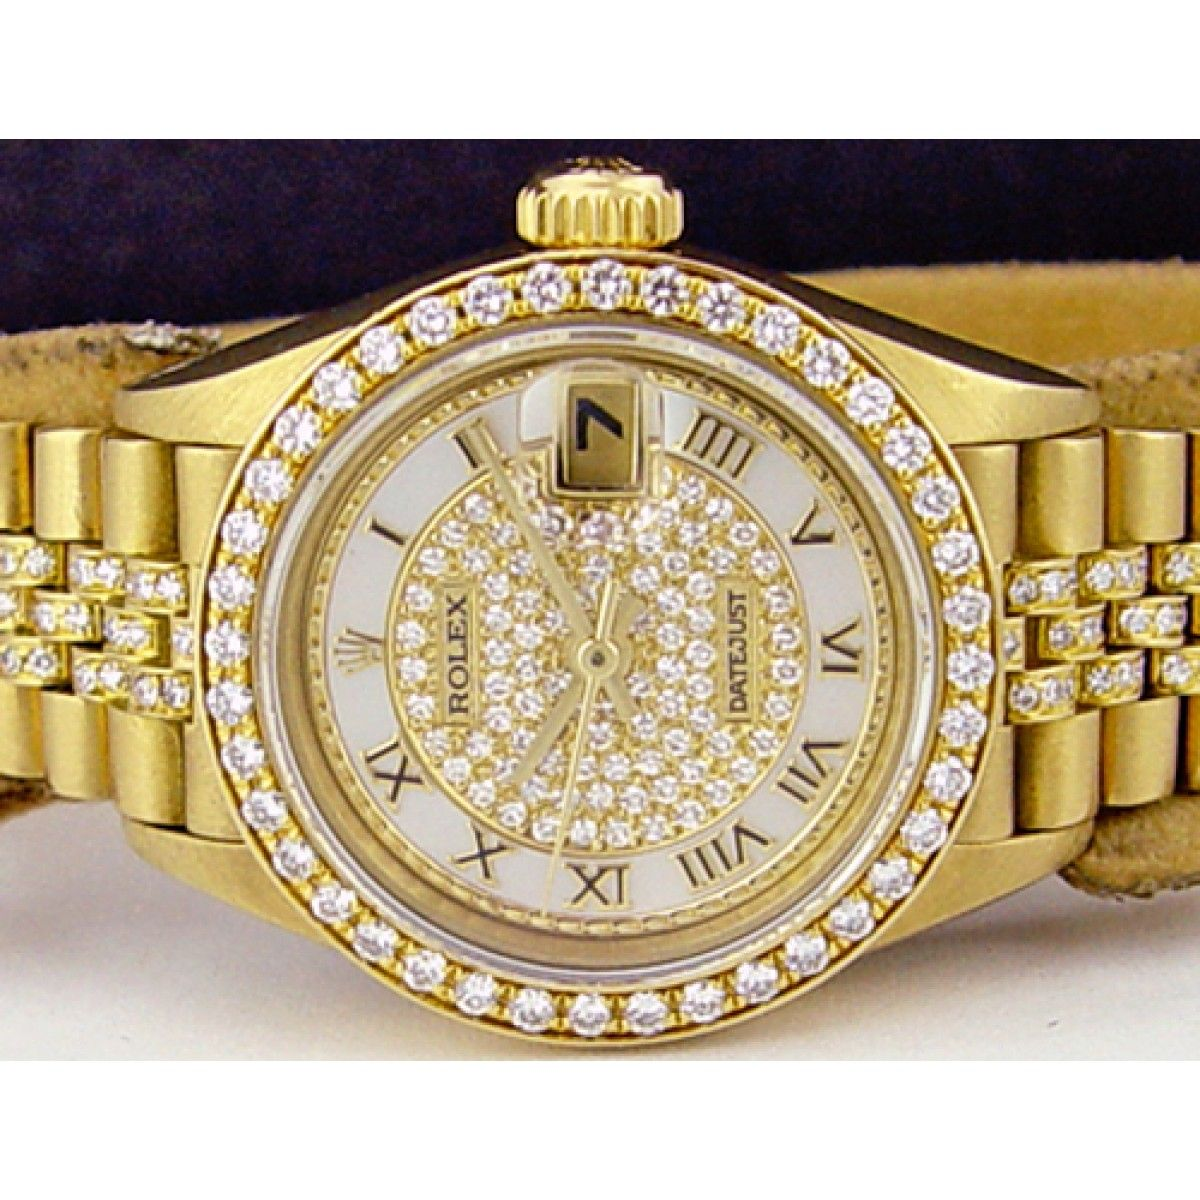 Most Inspiring Rolex Wallpaper - b5d14714a66e240be0658ffed3aeafd3 Picture_346861.jpg